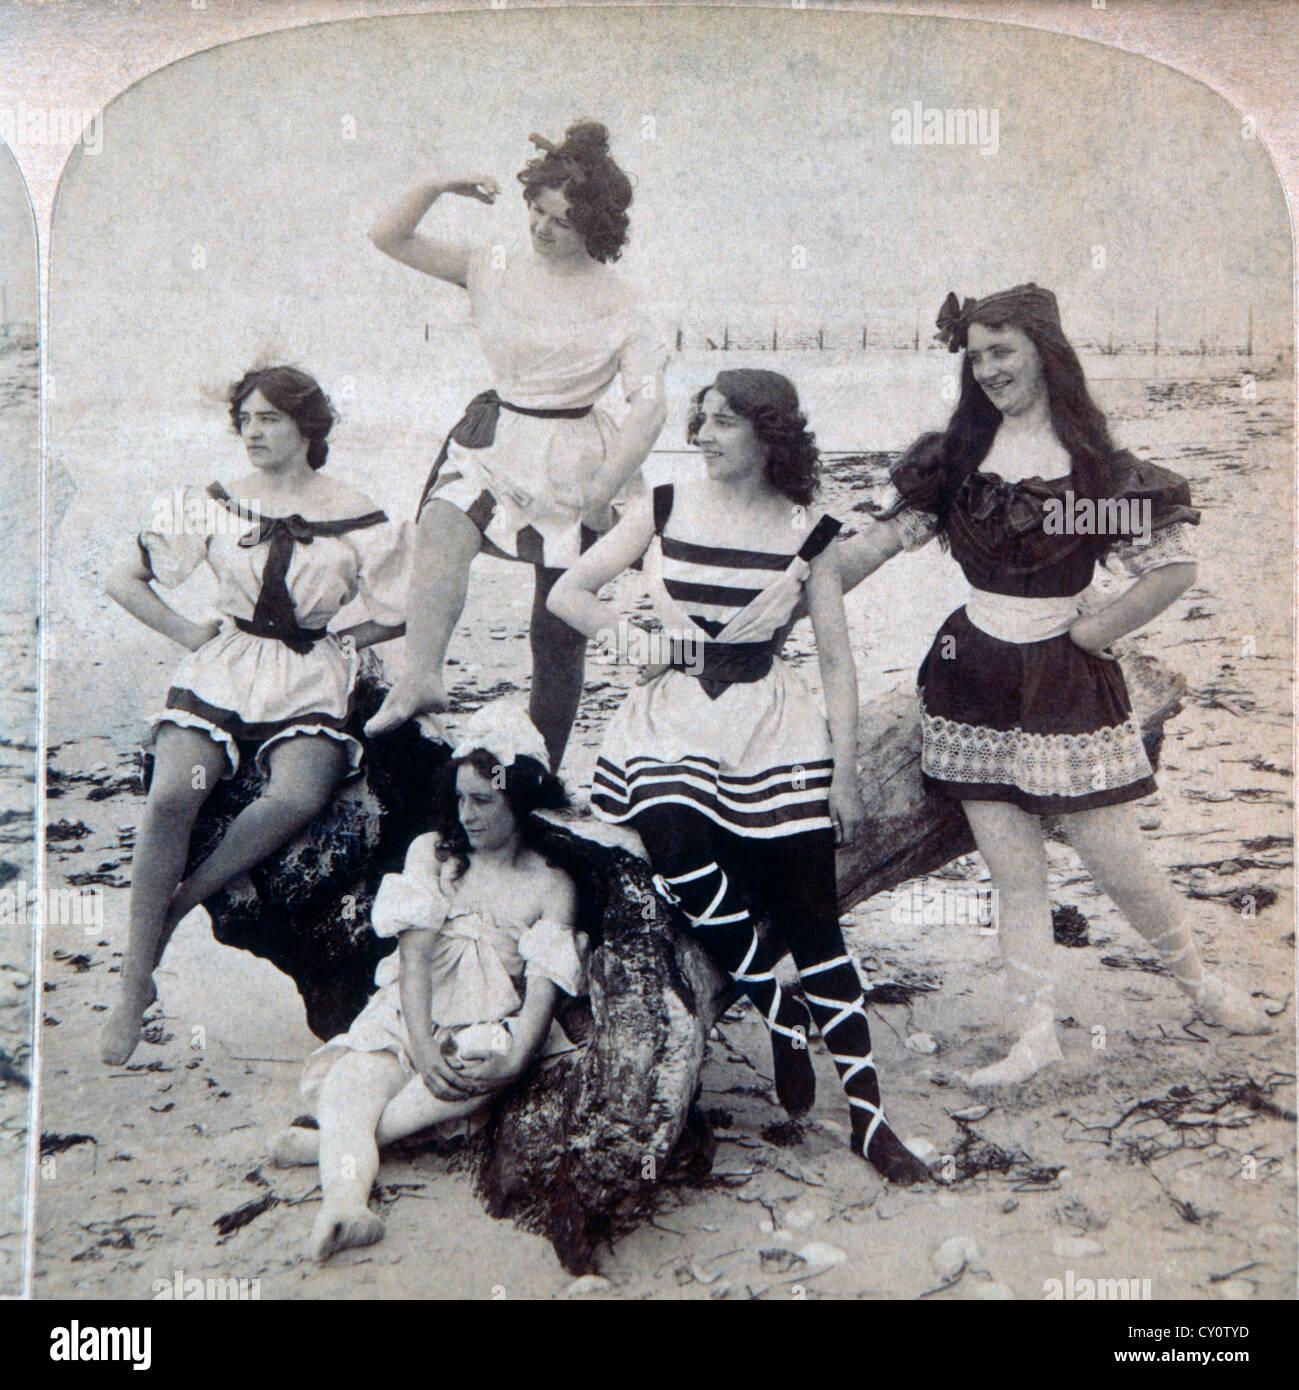 Fünf Frauen am Strand USA, Stereo-Eiweiss zu fotografieren, ca. 1897 Stockbild